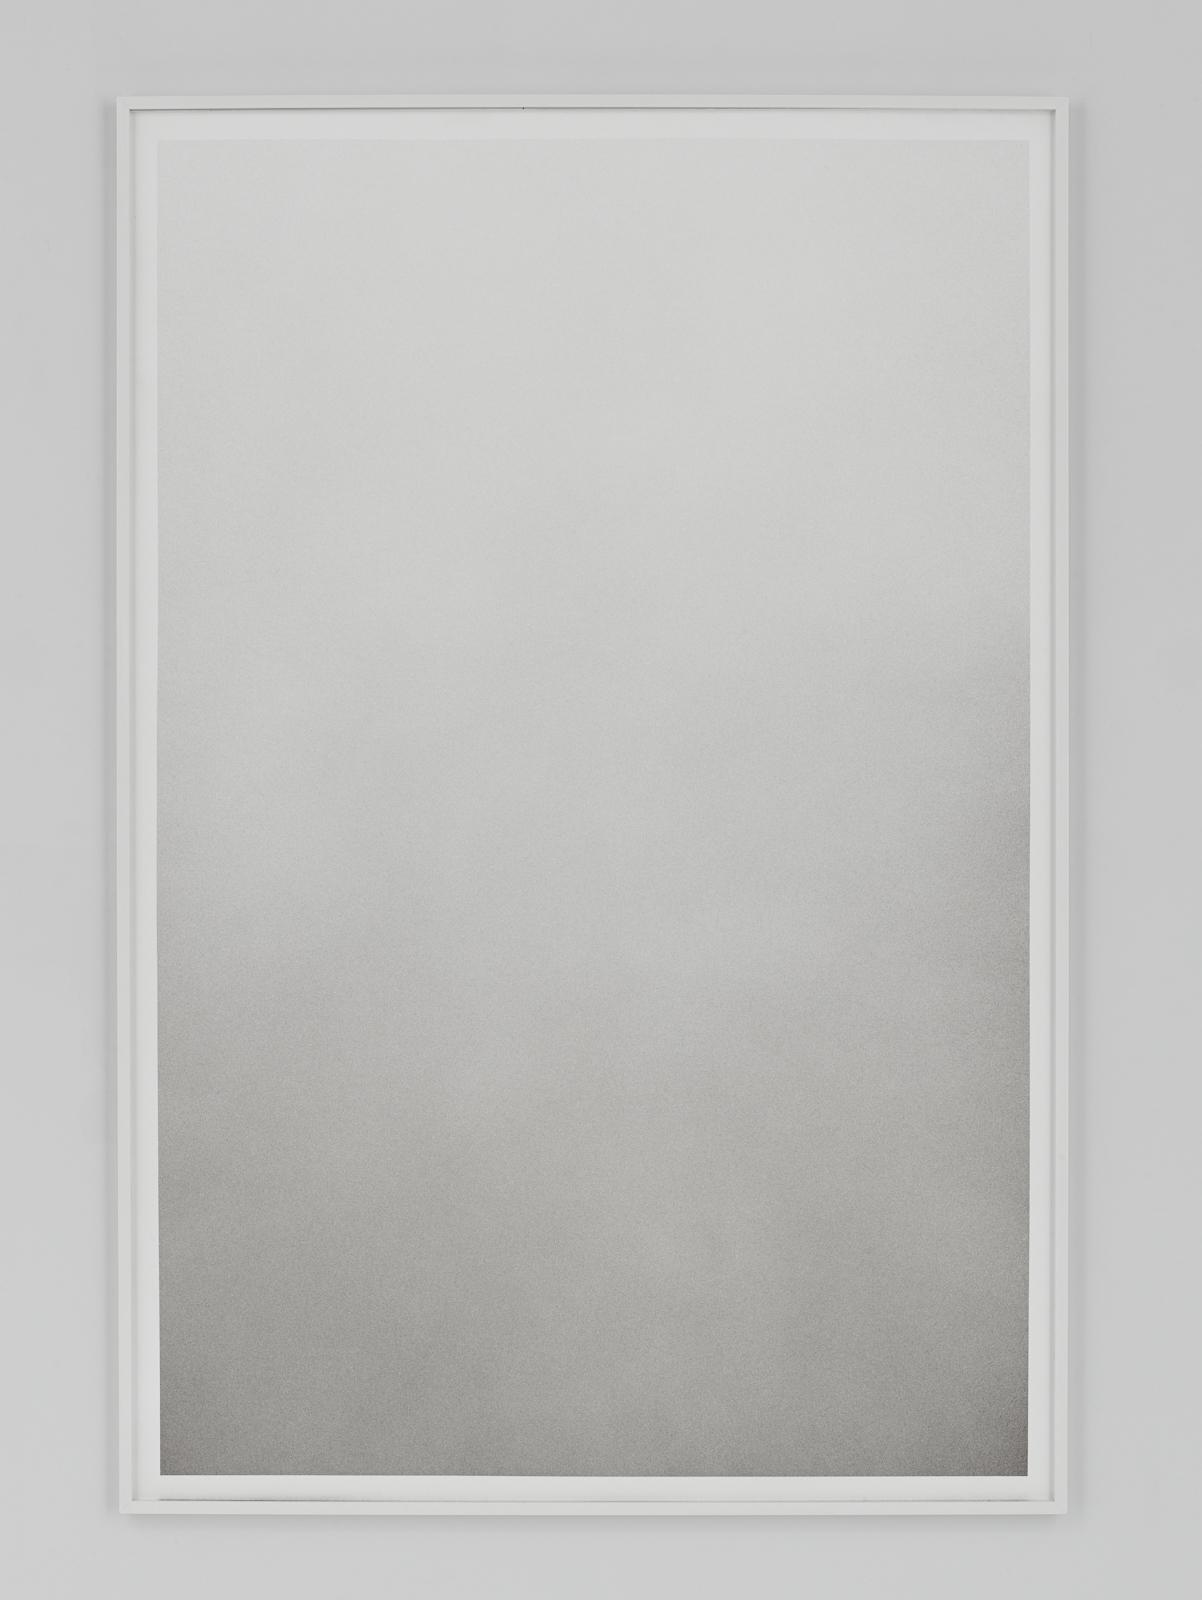 Liminal XIV    Terre de Cassel and gold powder on paper 121.5x81.5 cm 2017